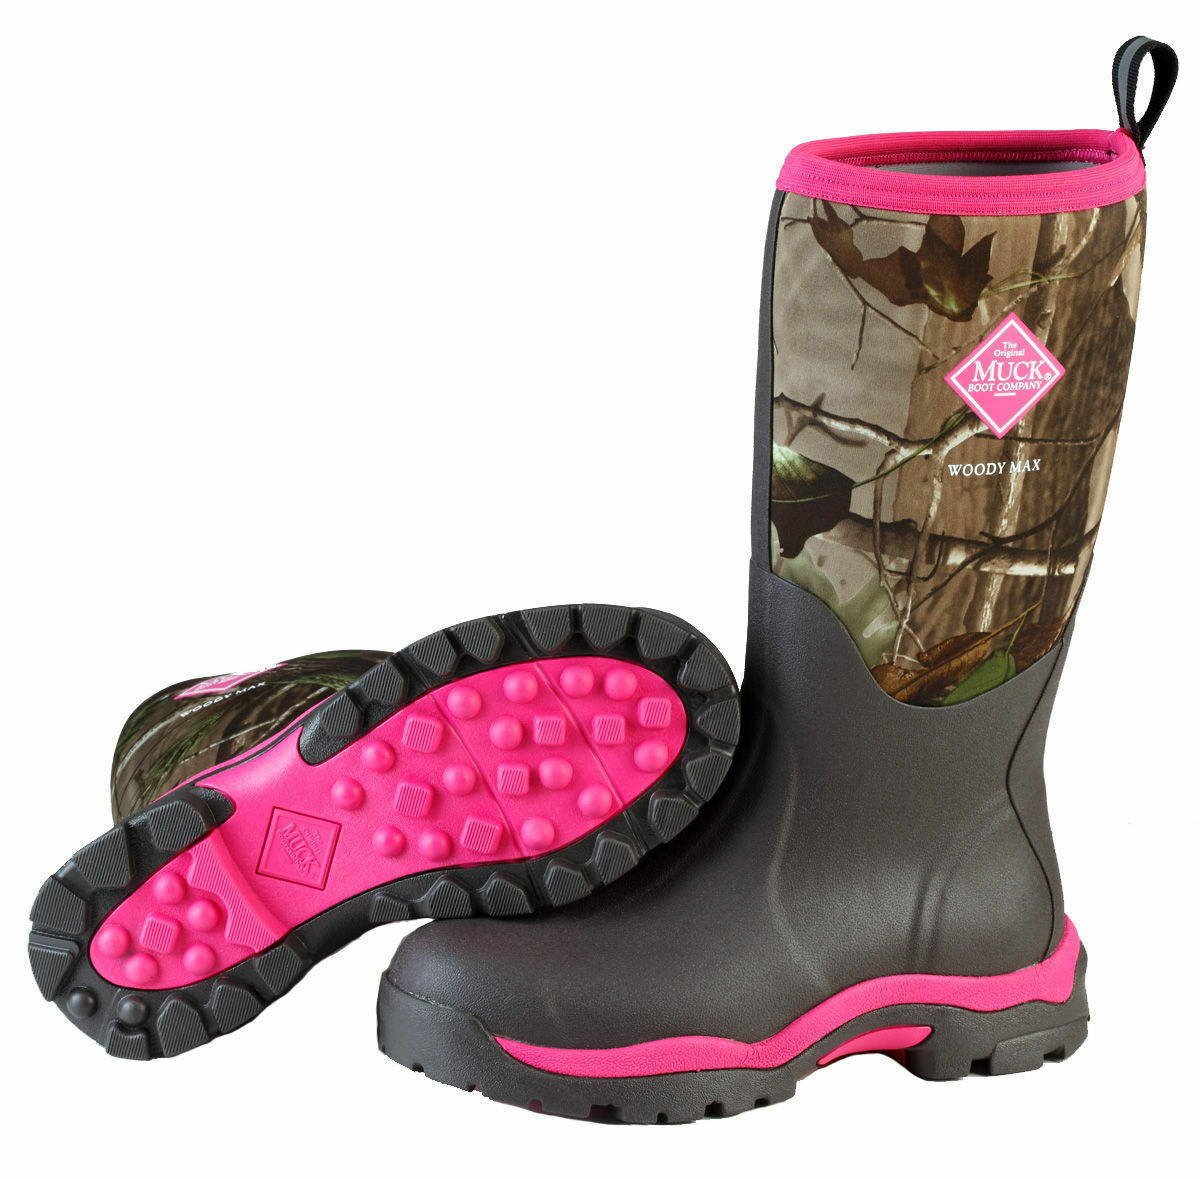 a2c48768d83 NEW MUCK WWPK-RAPG Woody PK Pink Camo Women's Boots HUNT Size Sz  6,7,8,9,10,11